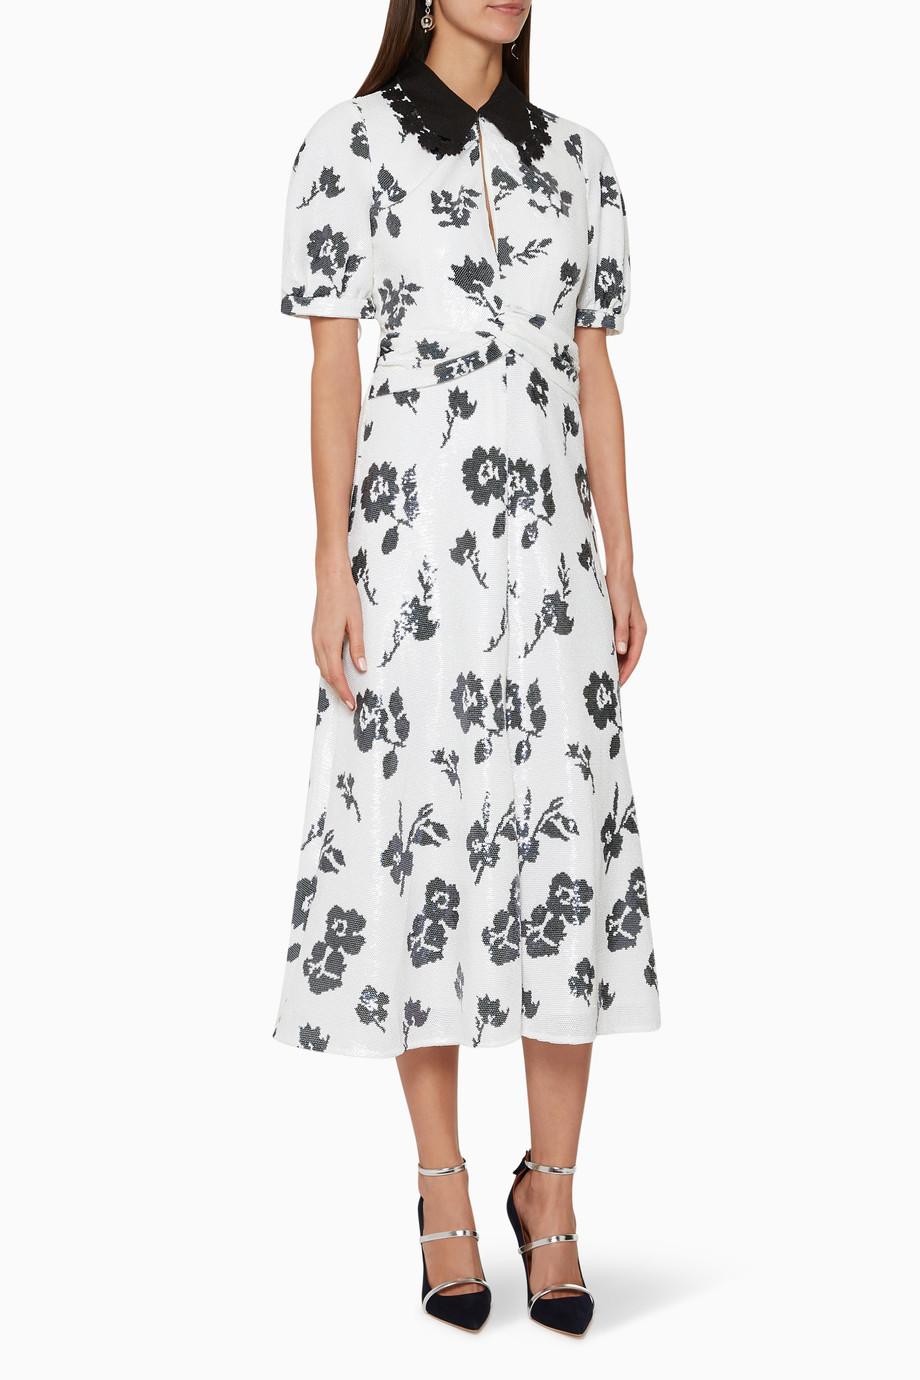 4976ae704bab Shop Self-Portrait White Floral Sequin Midi Dress for Women | Ounass